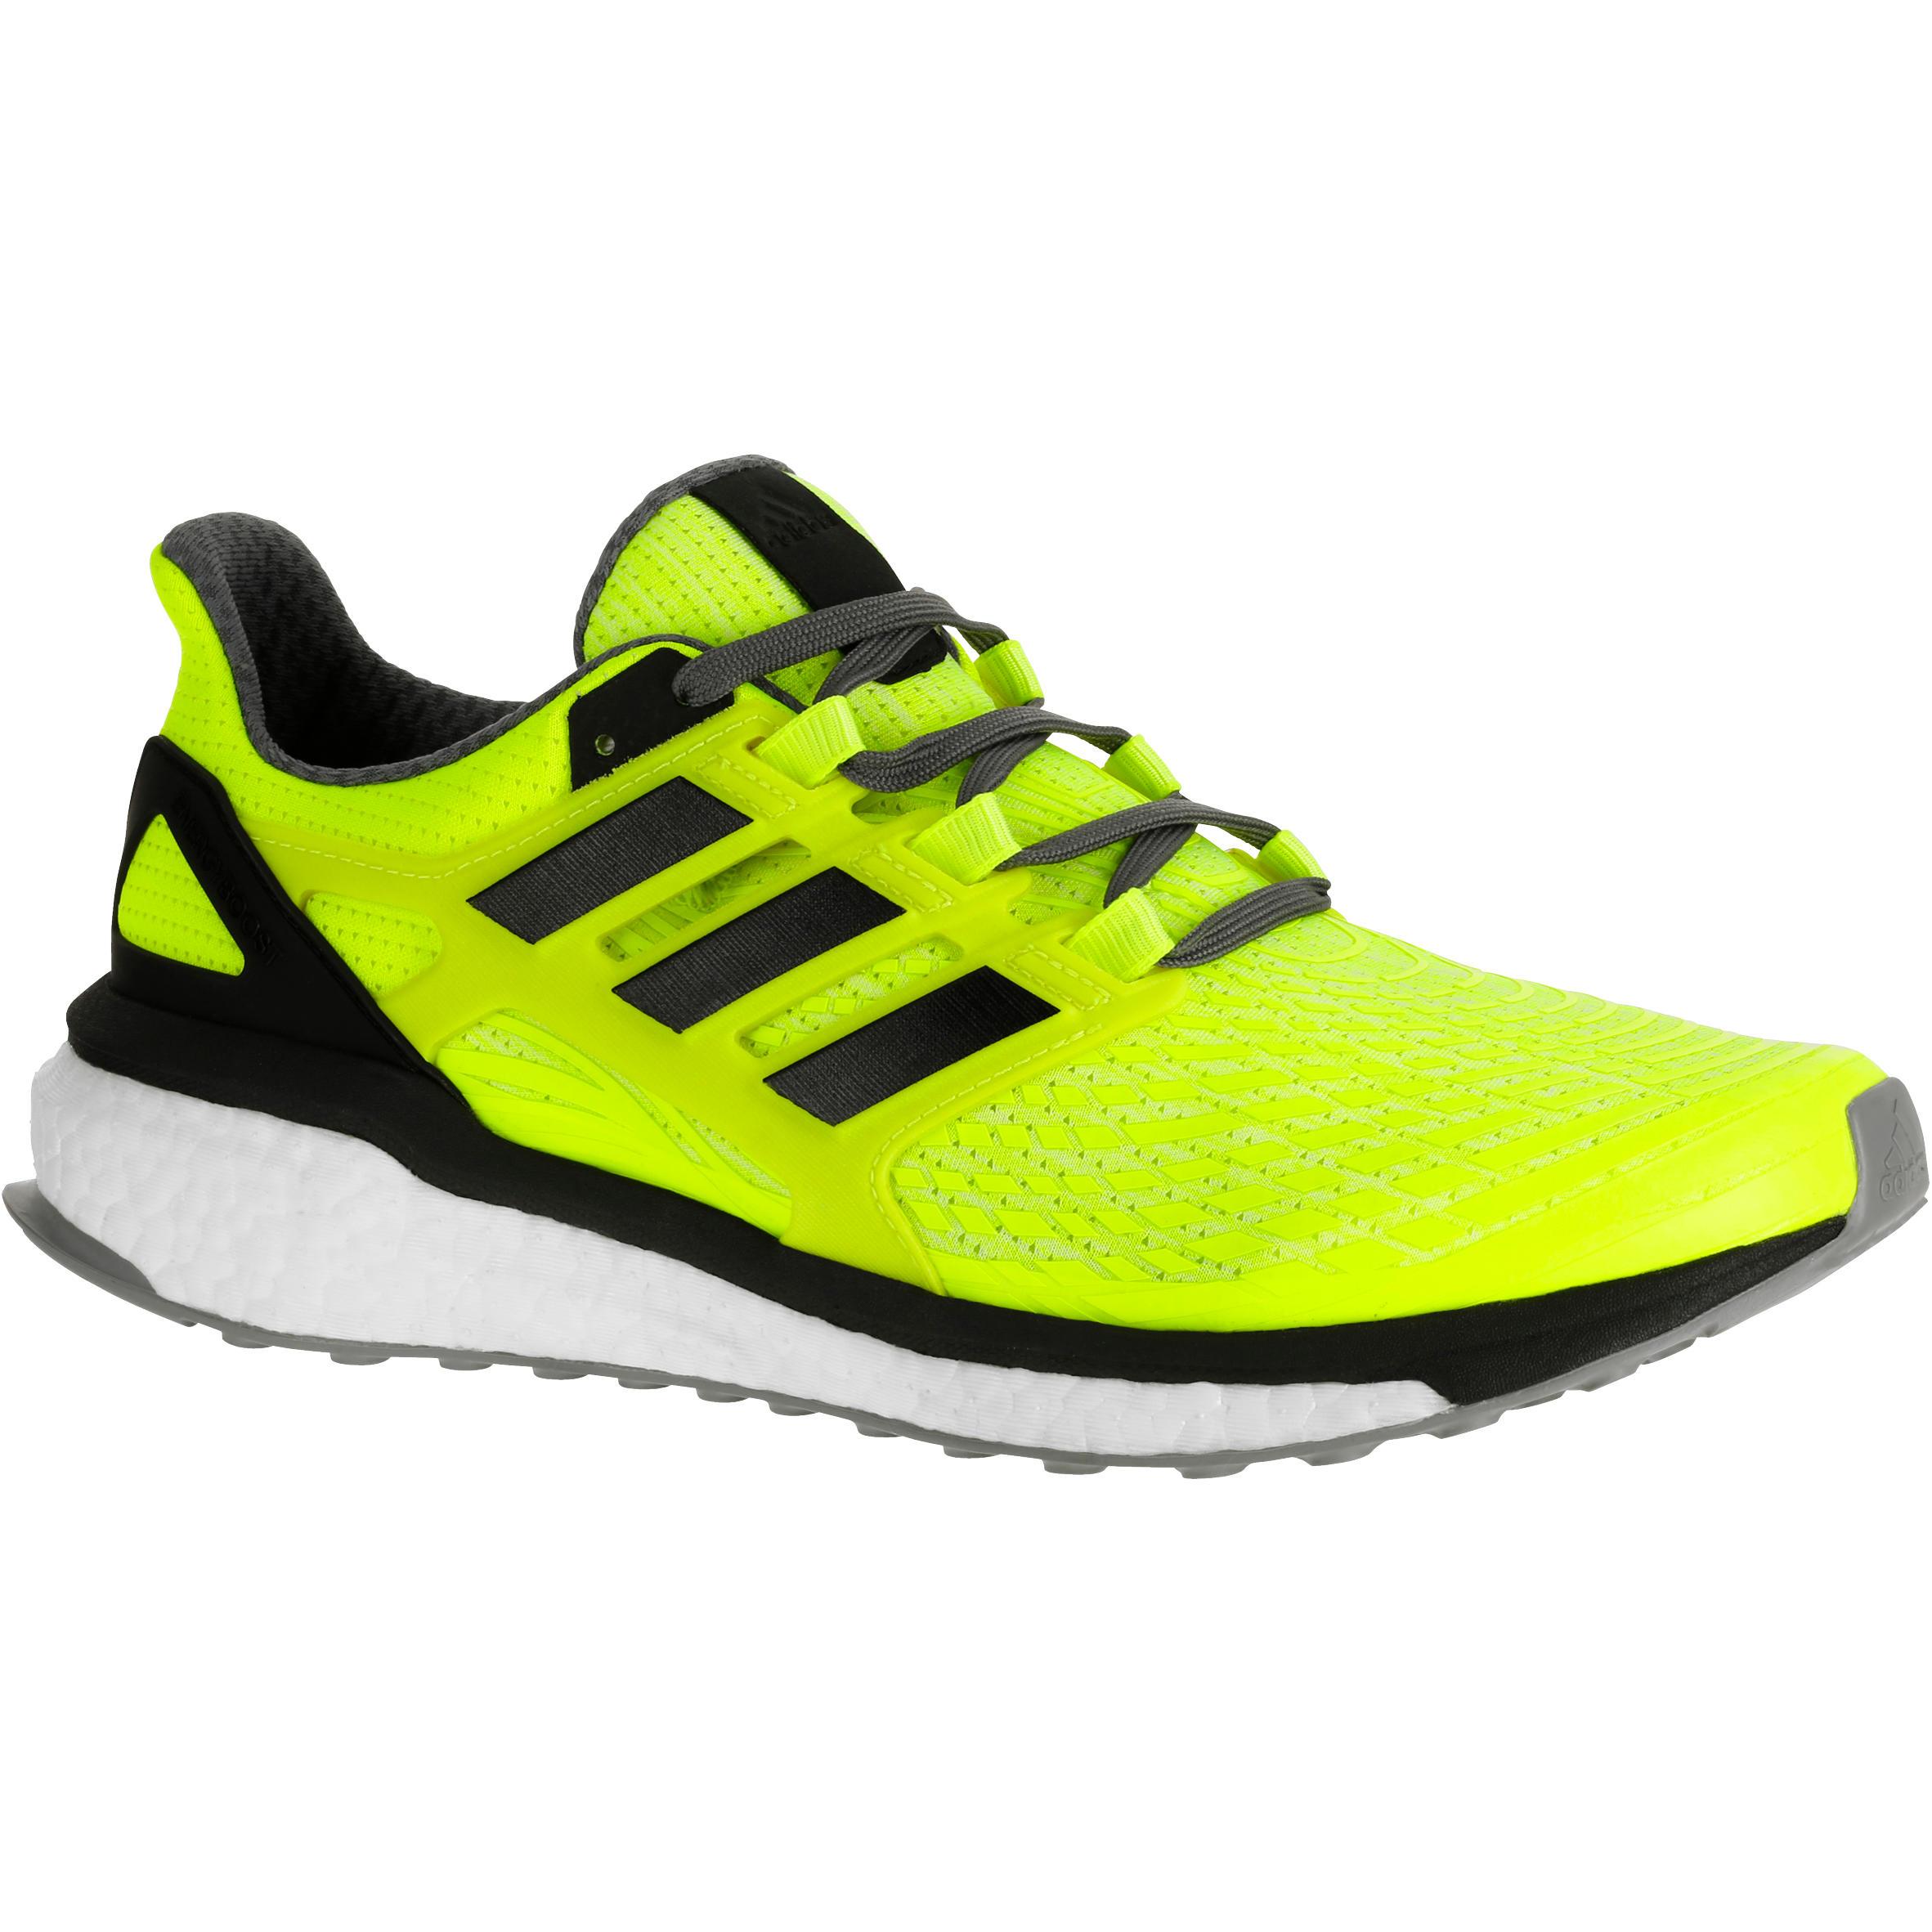 Adidas Energy Boost 3 Men's Running Shoes - Yellow - Decathlon